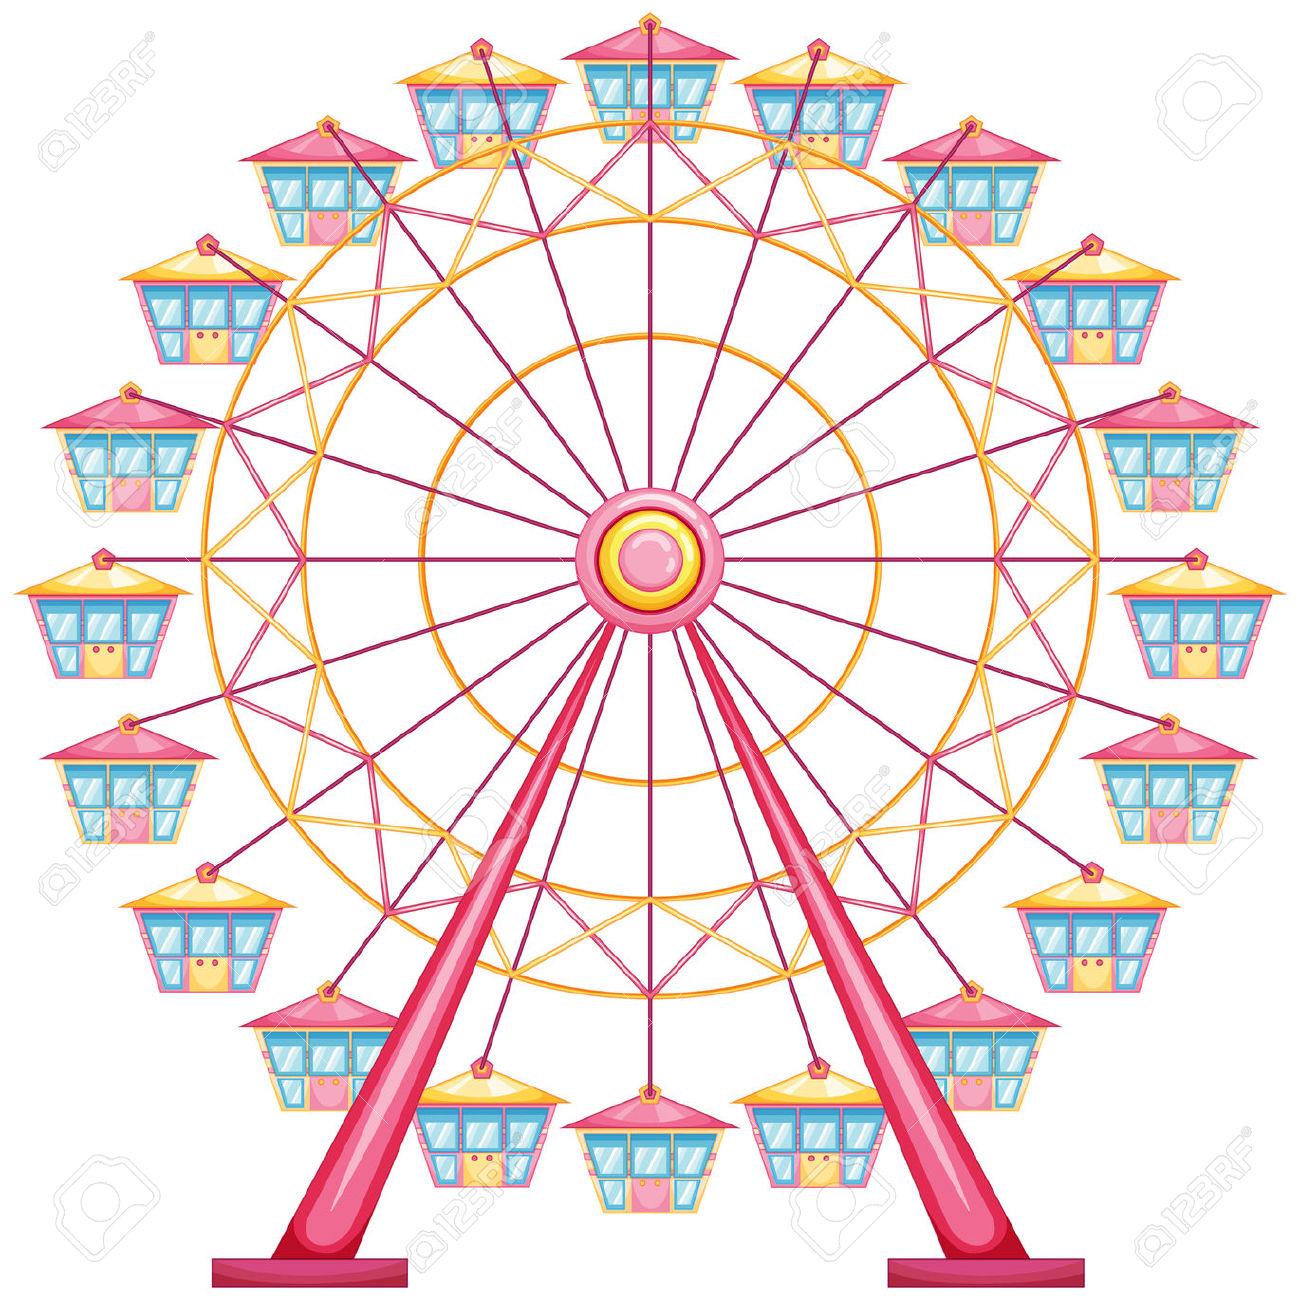 707 Ferris Wheel free clipart.